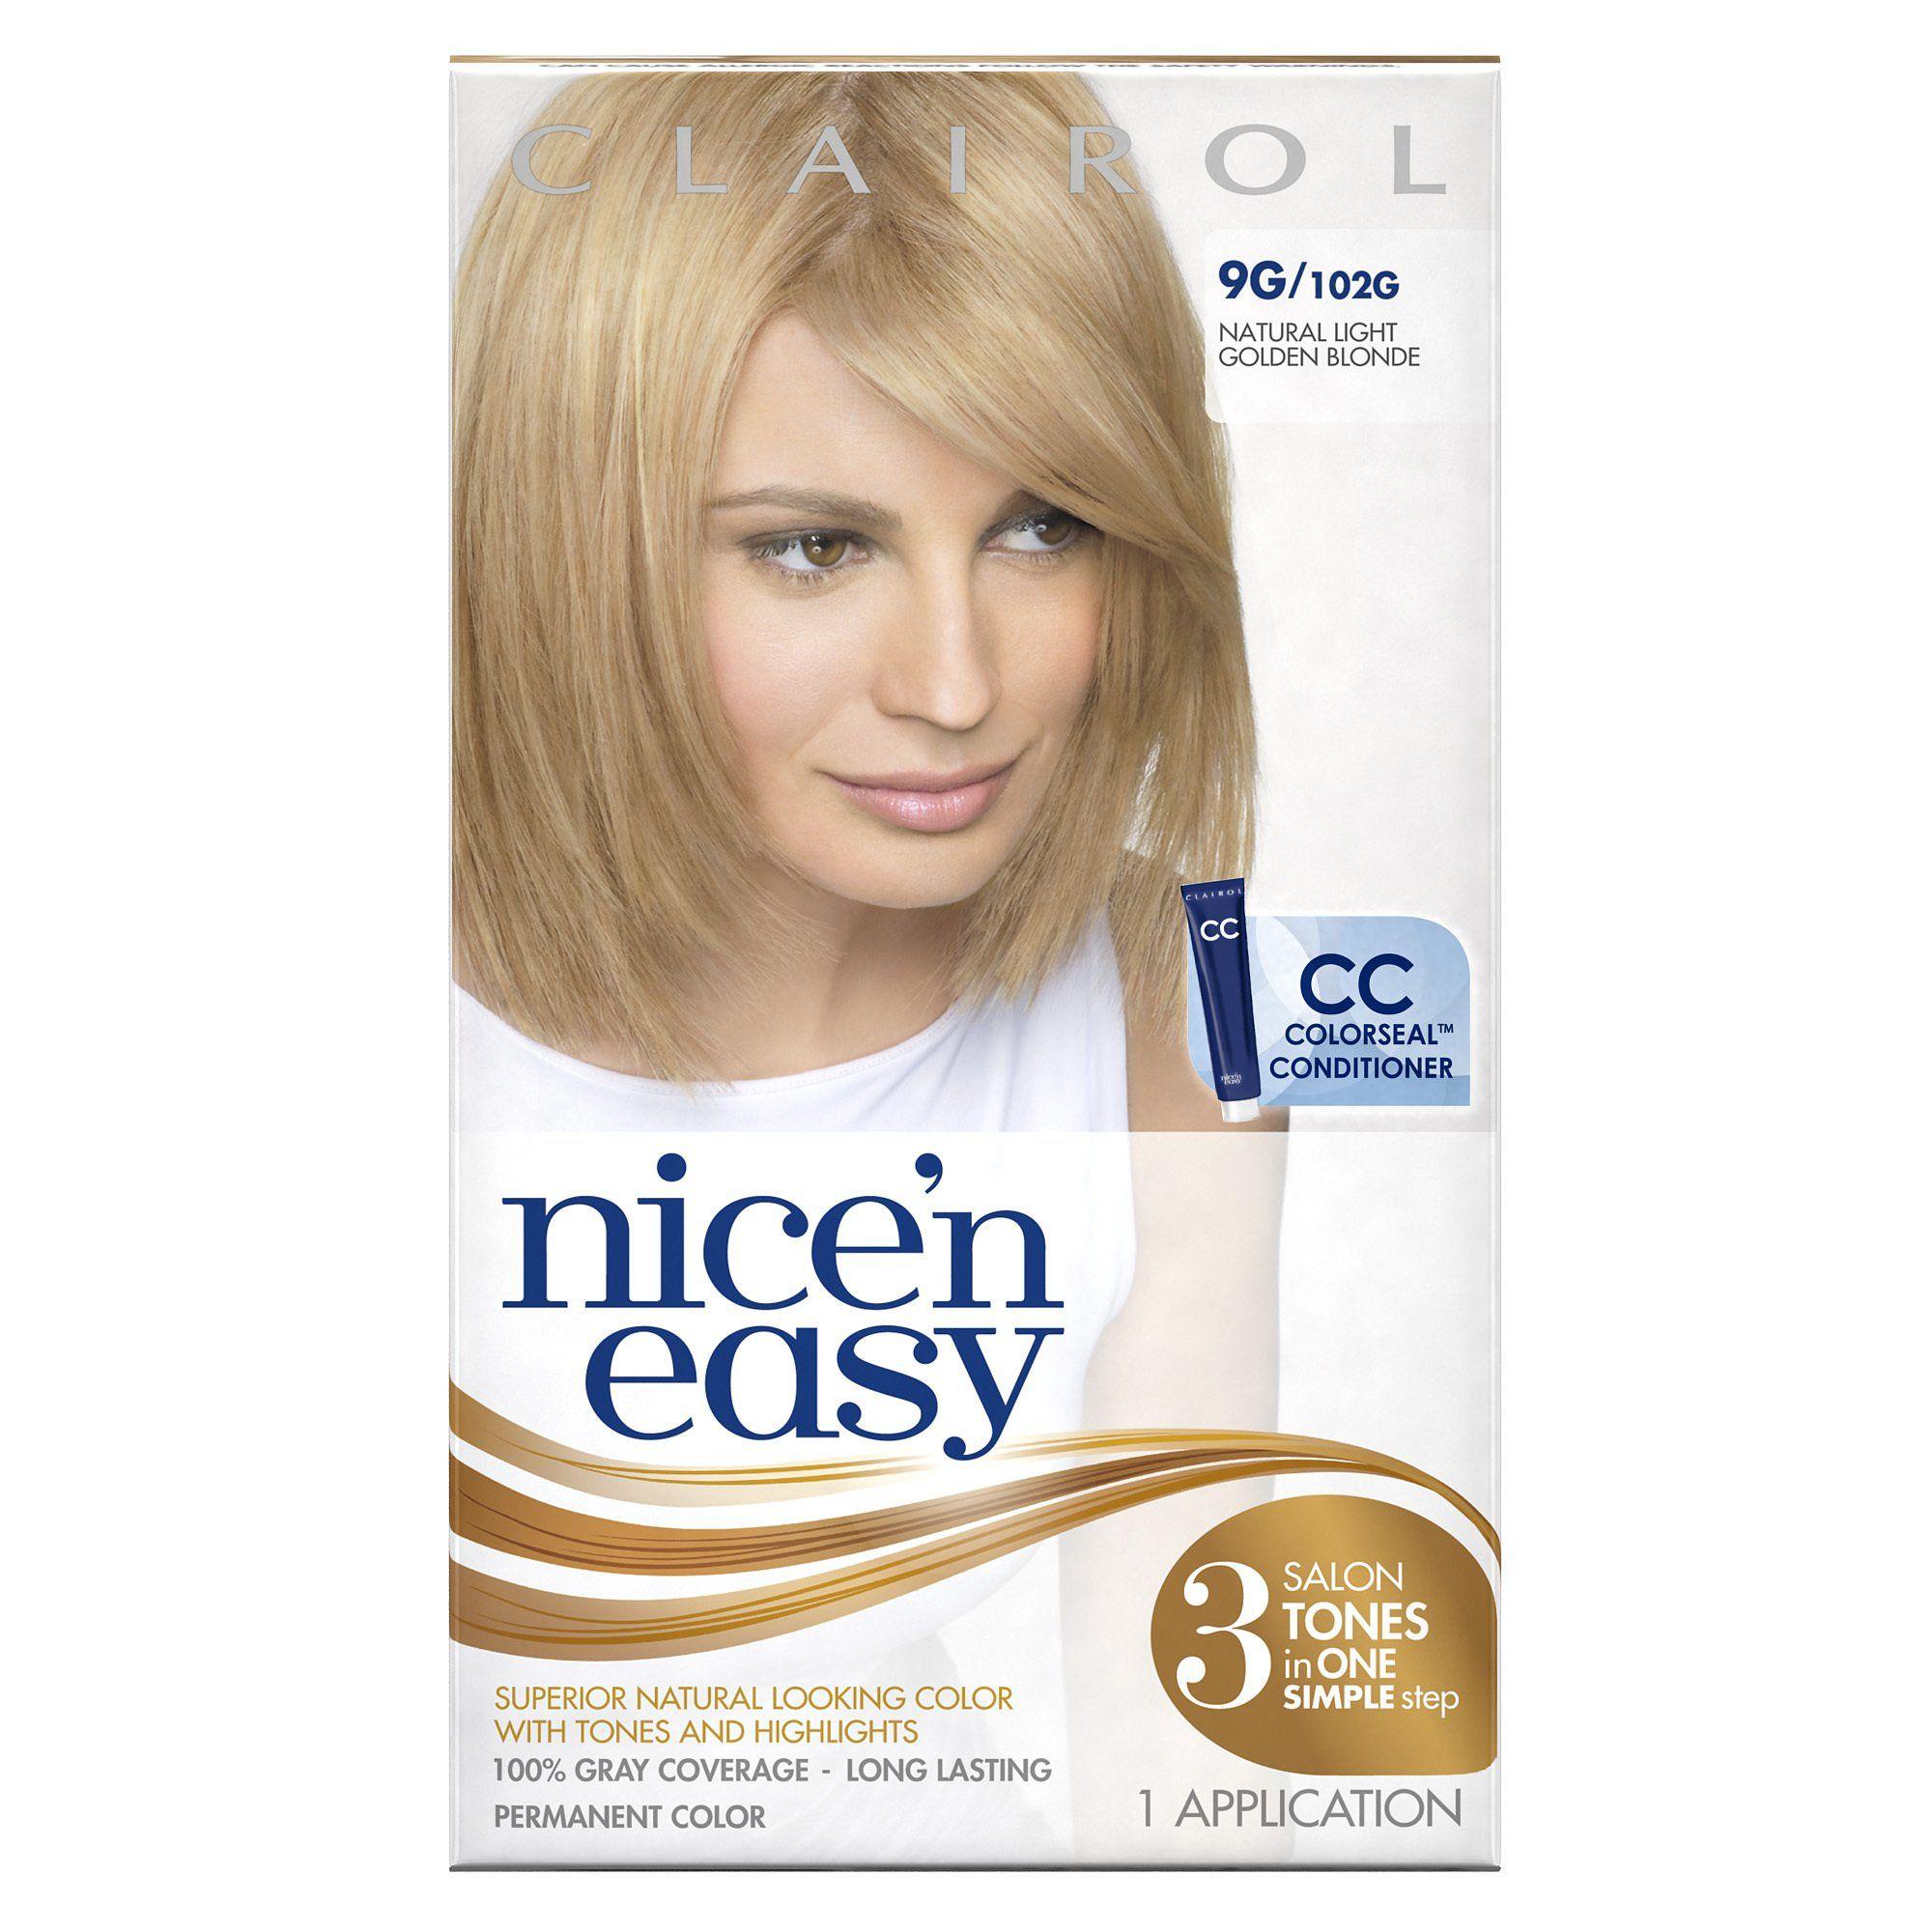 Garnier olia permanent hair colour golden brown 5 3 - Clairol Nice N Easy Hair Color 9g Natural Light Golden Blonde 1 Kit Superior